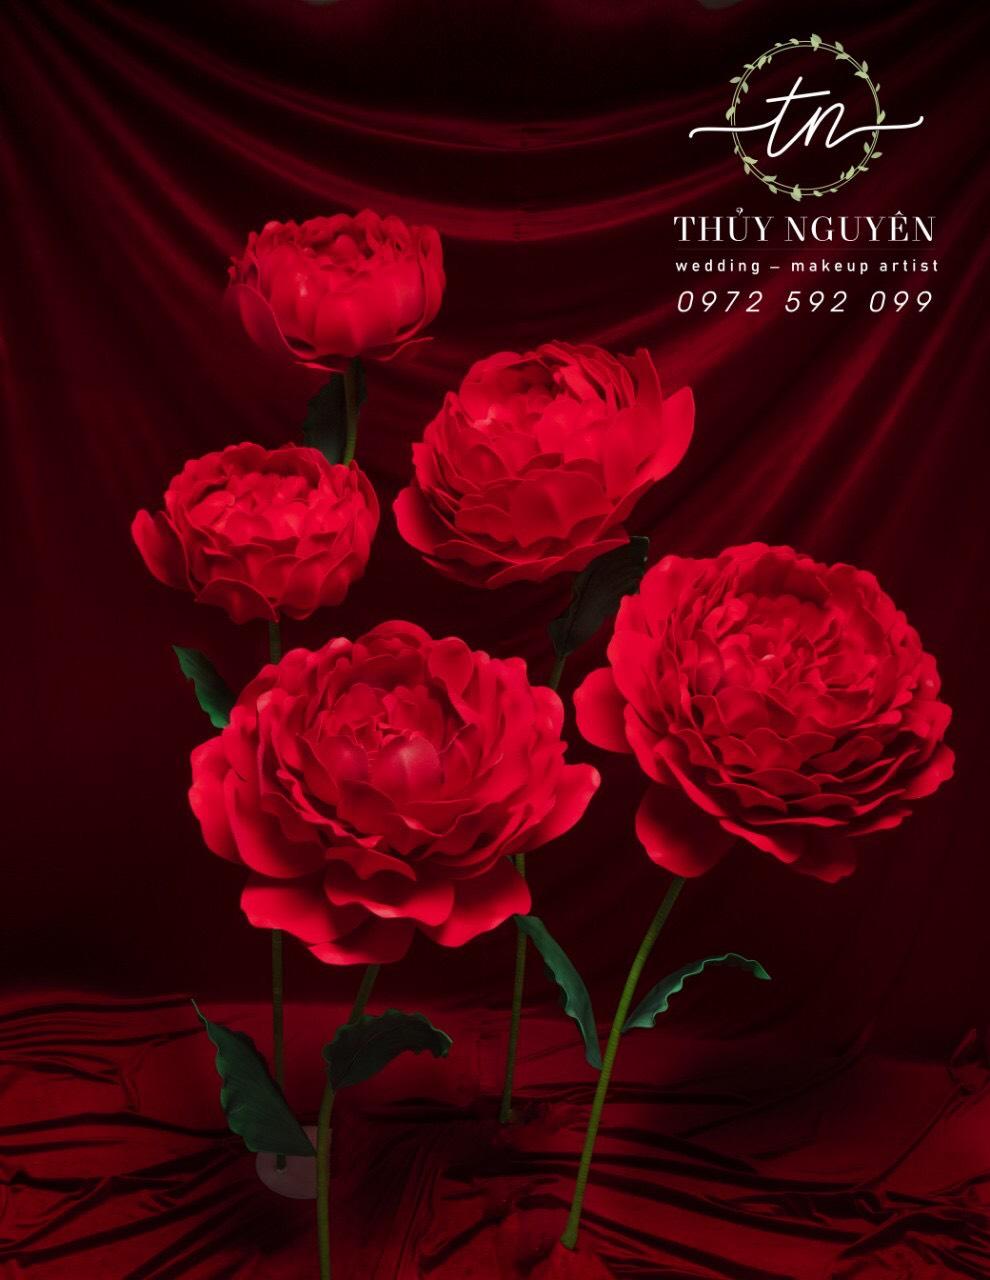 Hoa Mẫu Đơn Đỏ/ Nhã Đan Shop